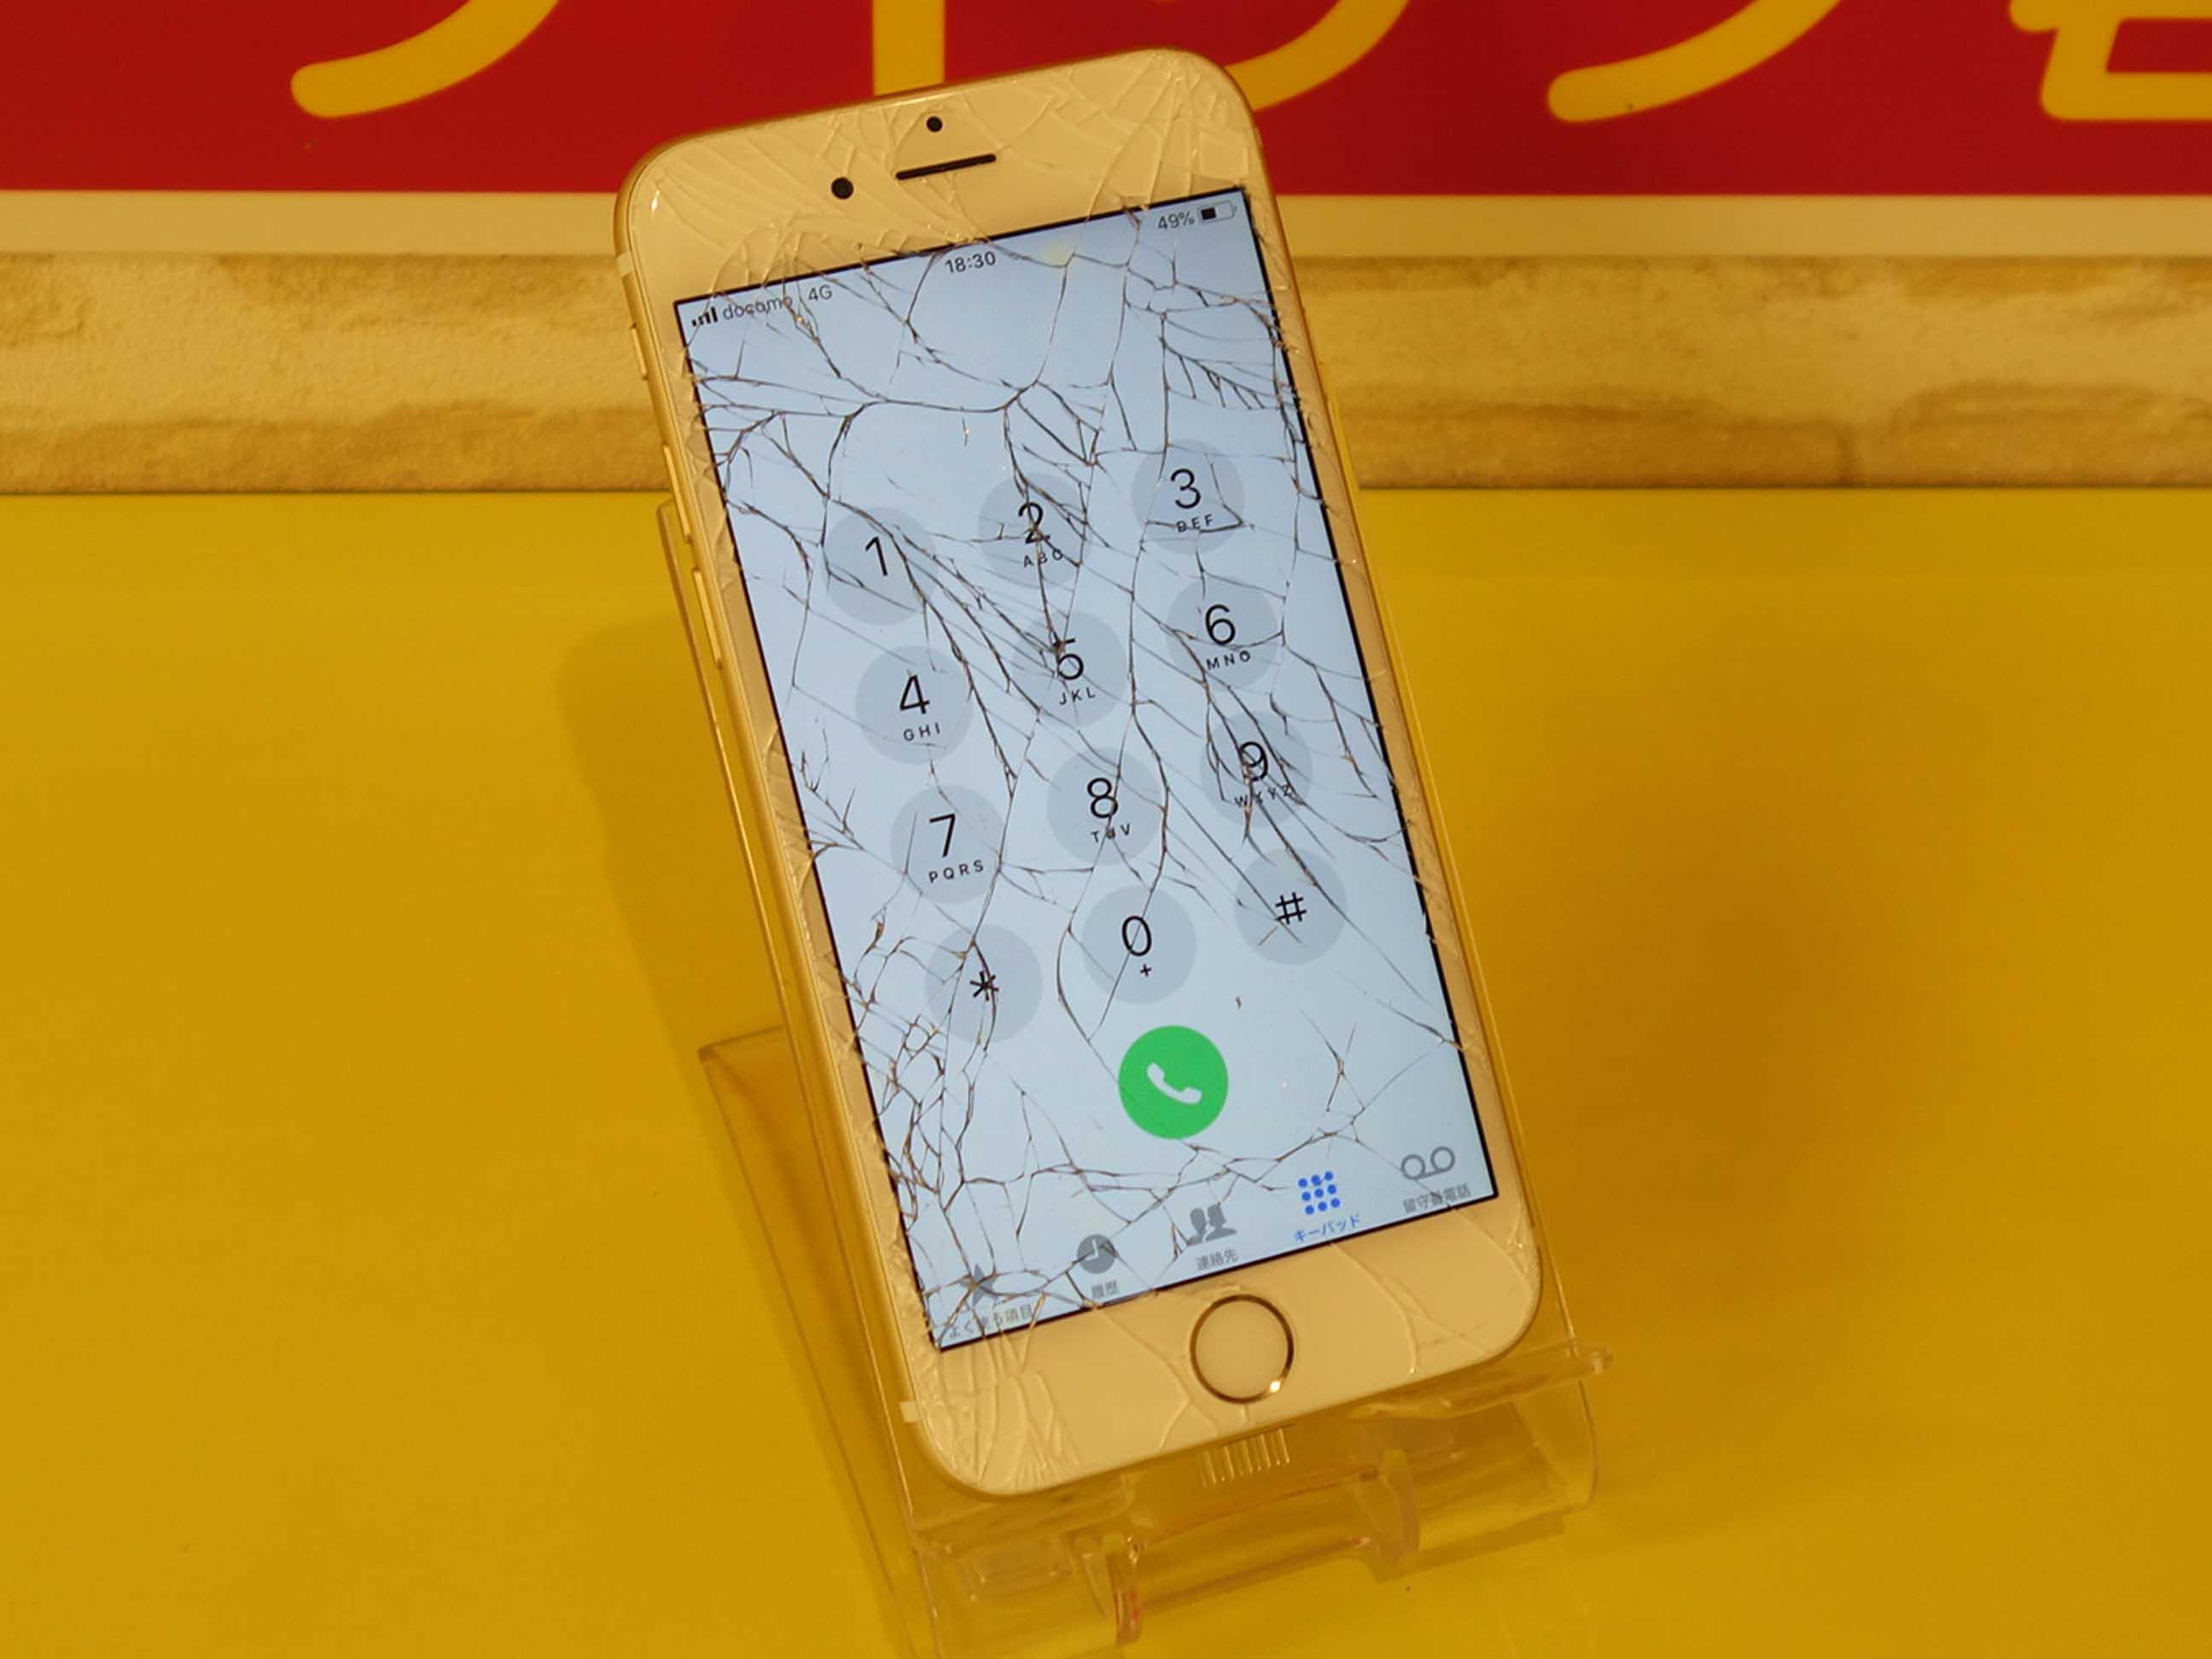 iPhone6のガラス交換修理に蟹江町よりご来店!アイフォン修理のクイック名古屋